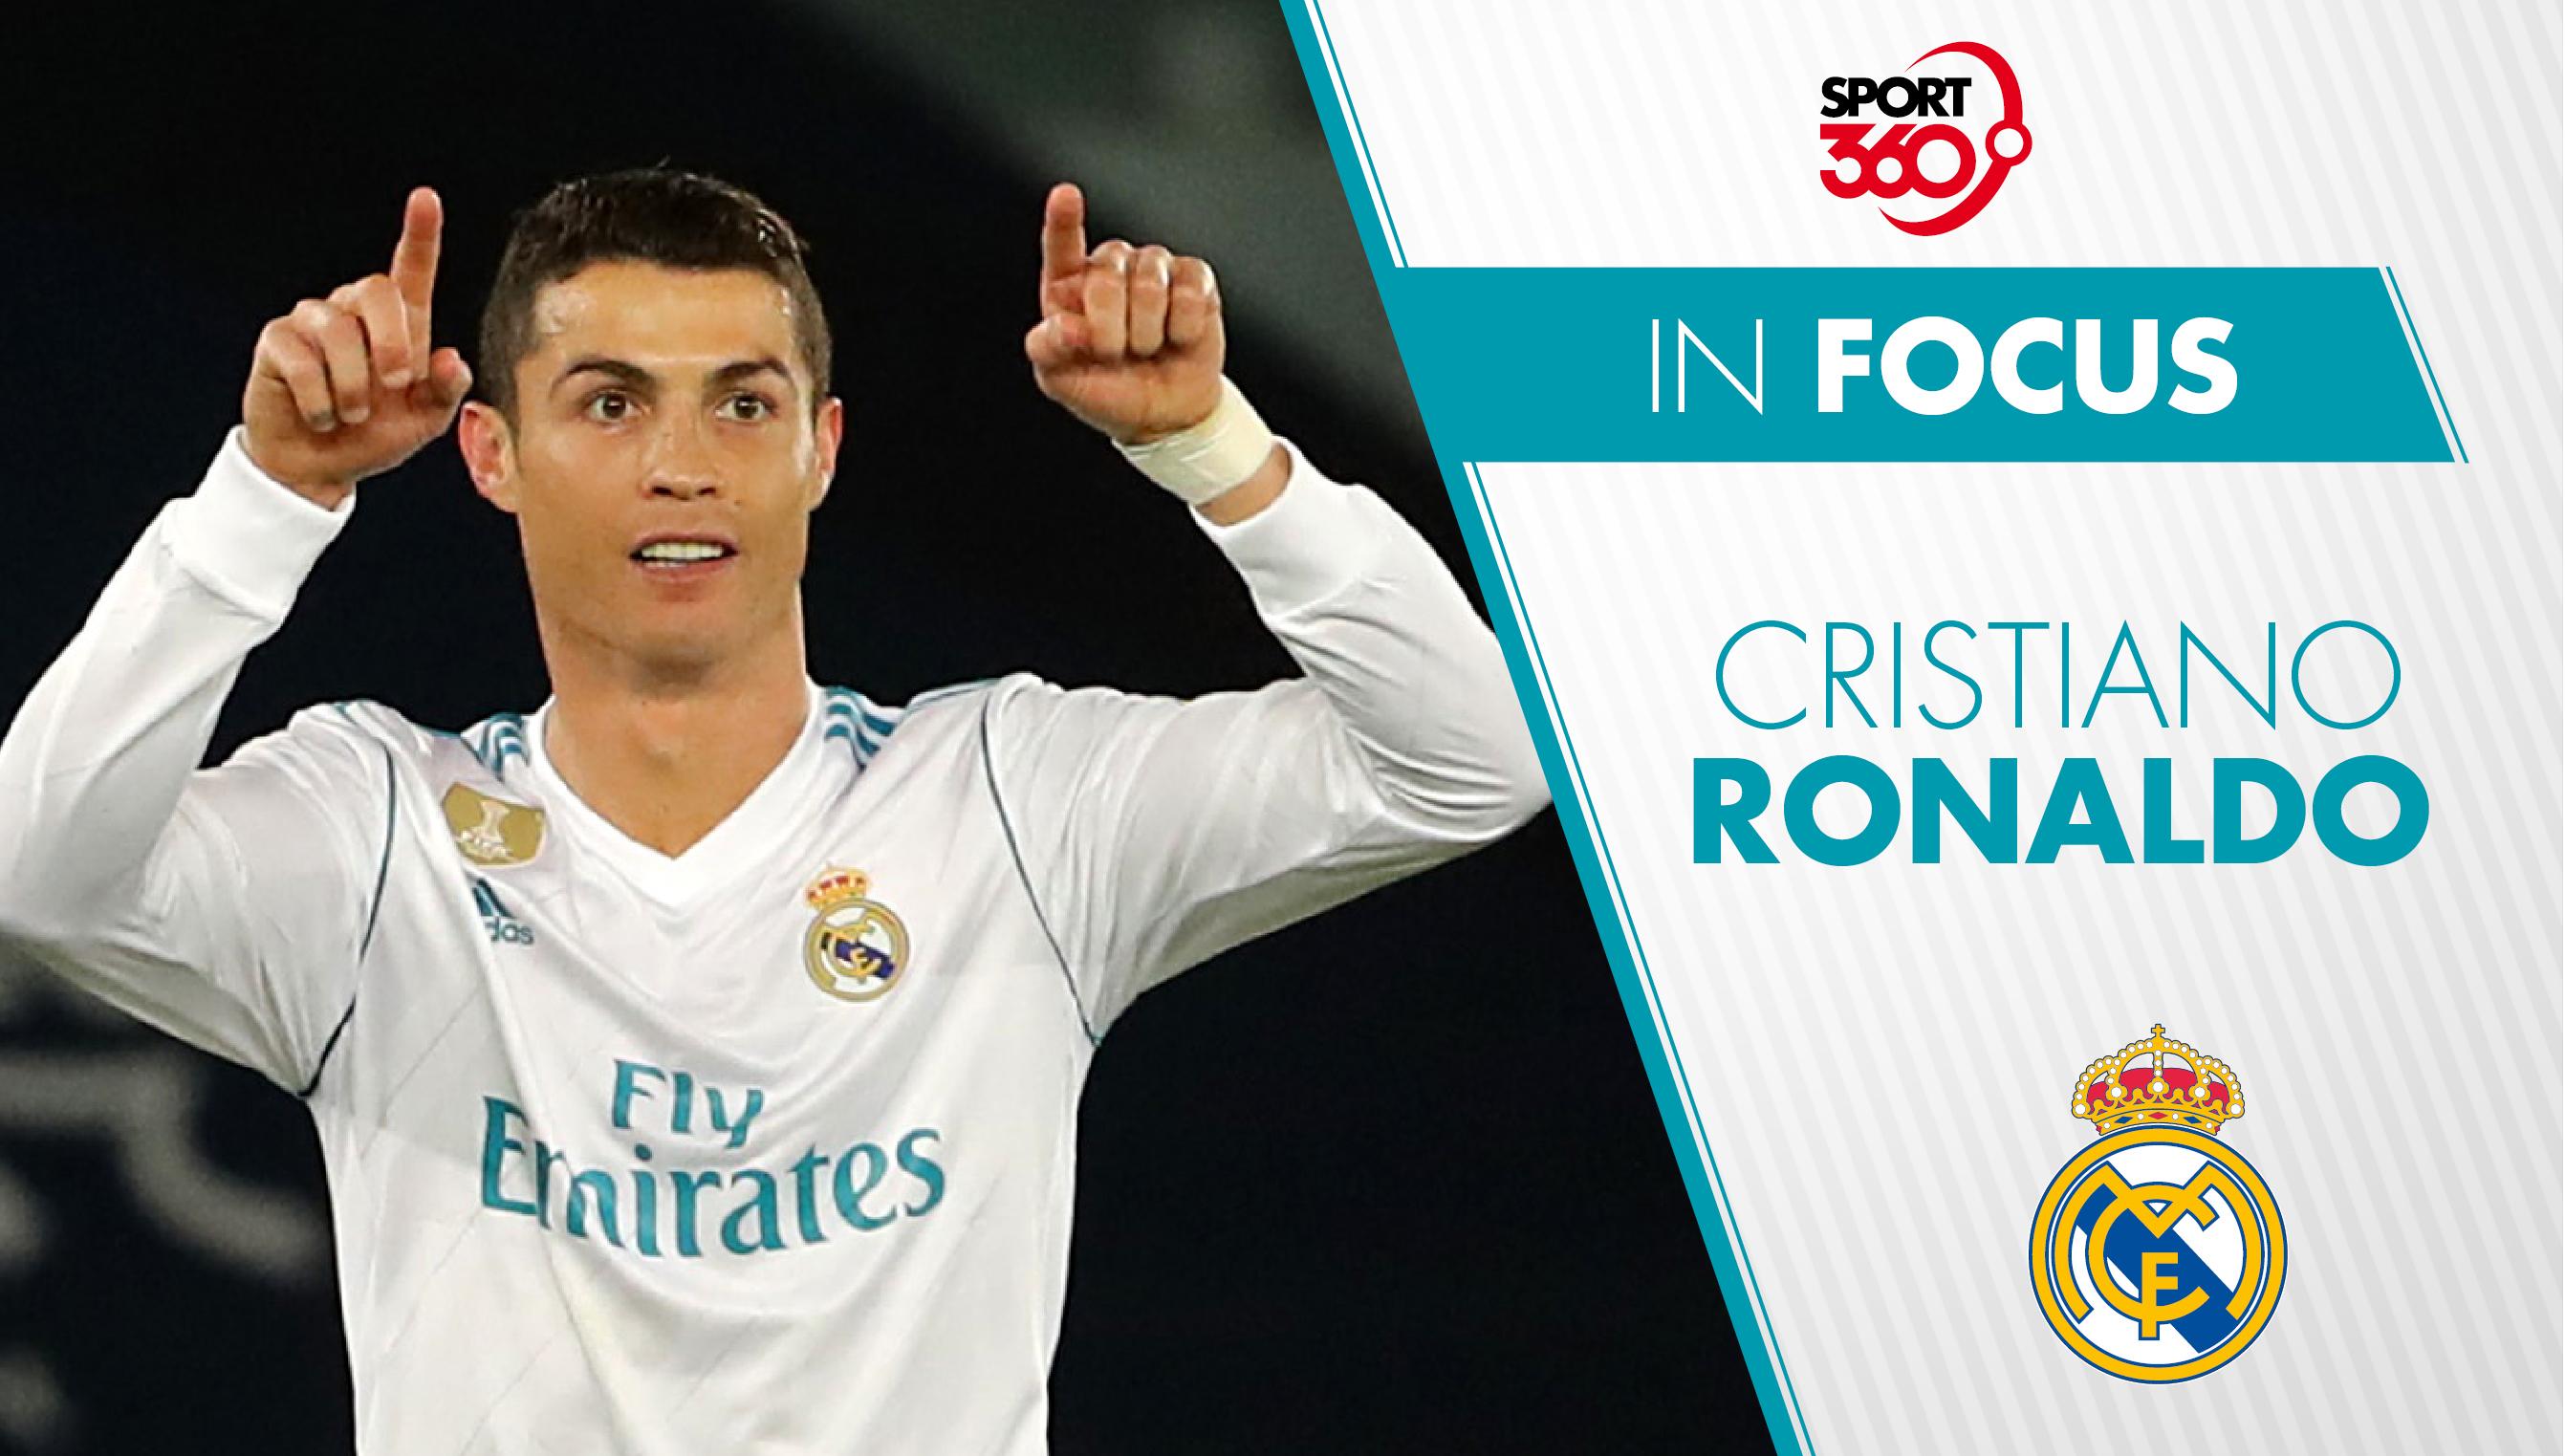 reputable site 850b8 00bd6 Analysis of Cristiano Ronaldo's two-goal display as Real ...